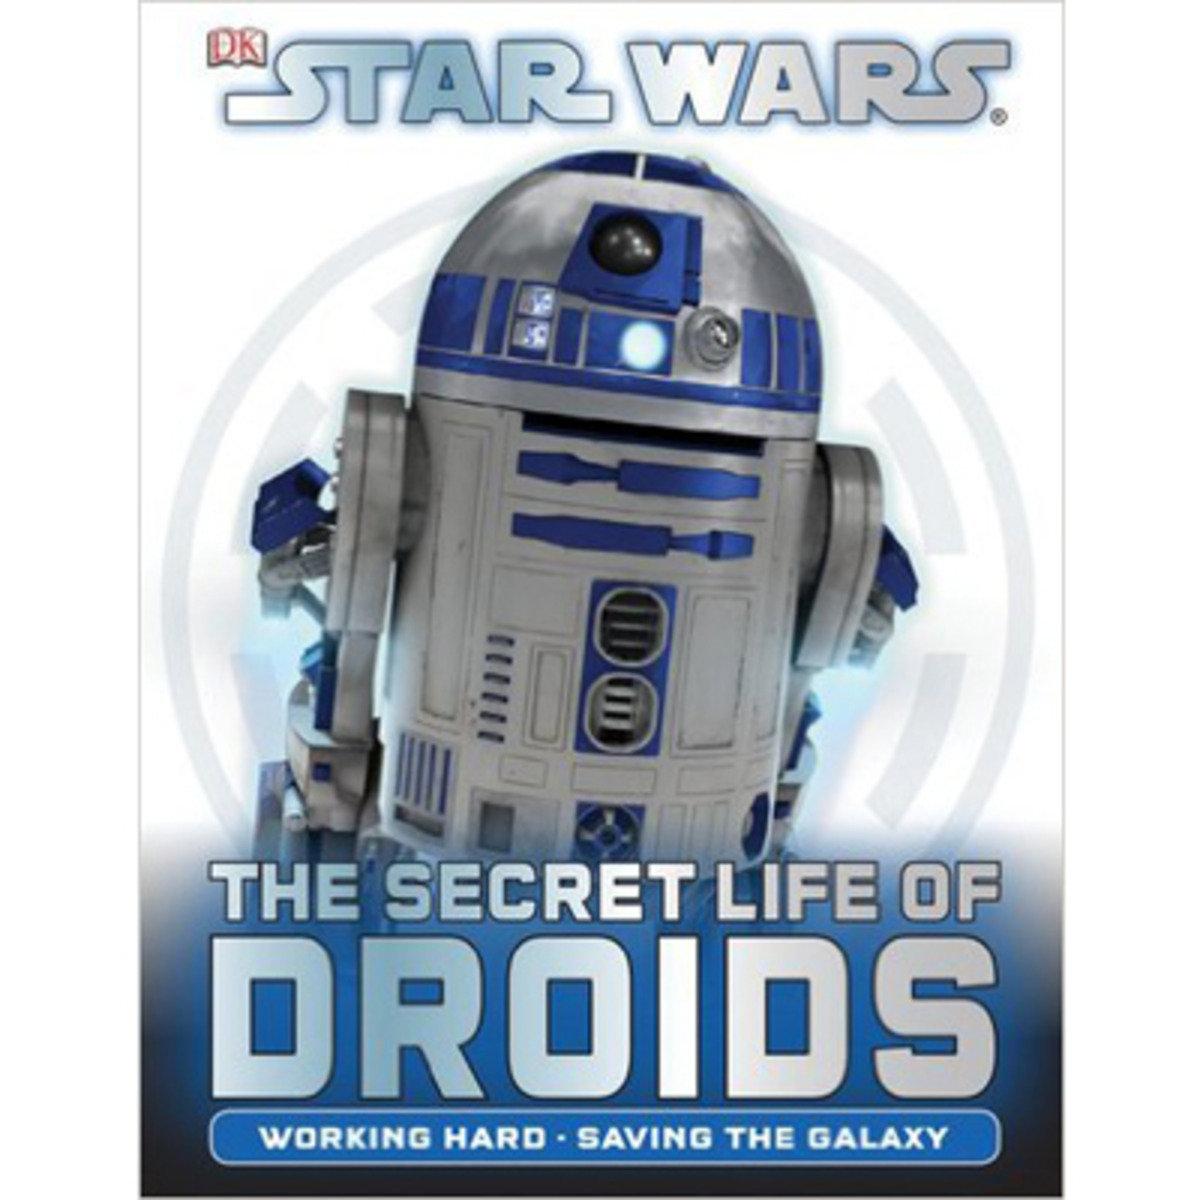 Star Wars: The Secret Life of Droids